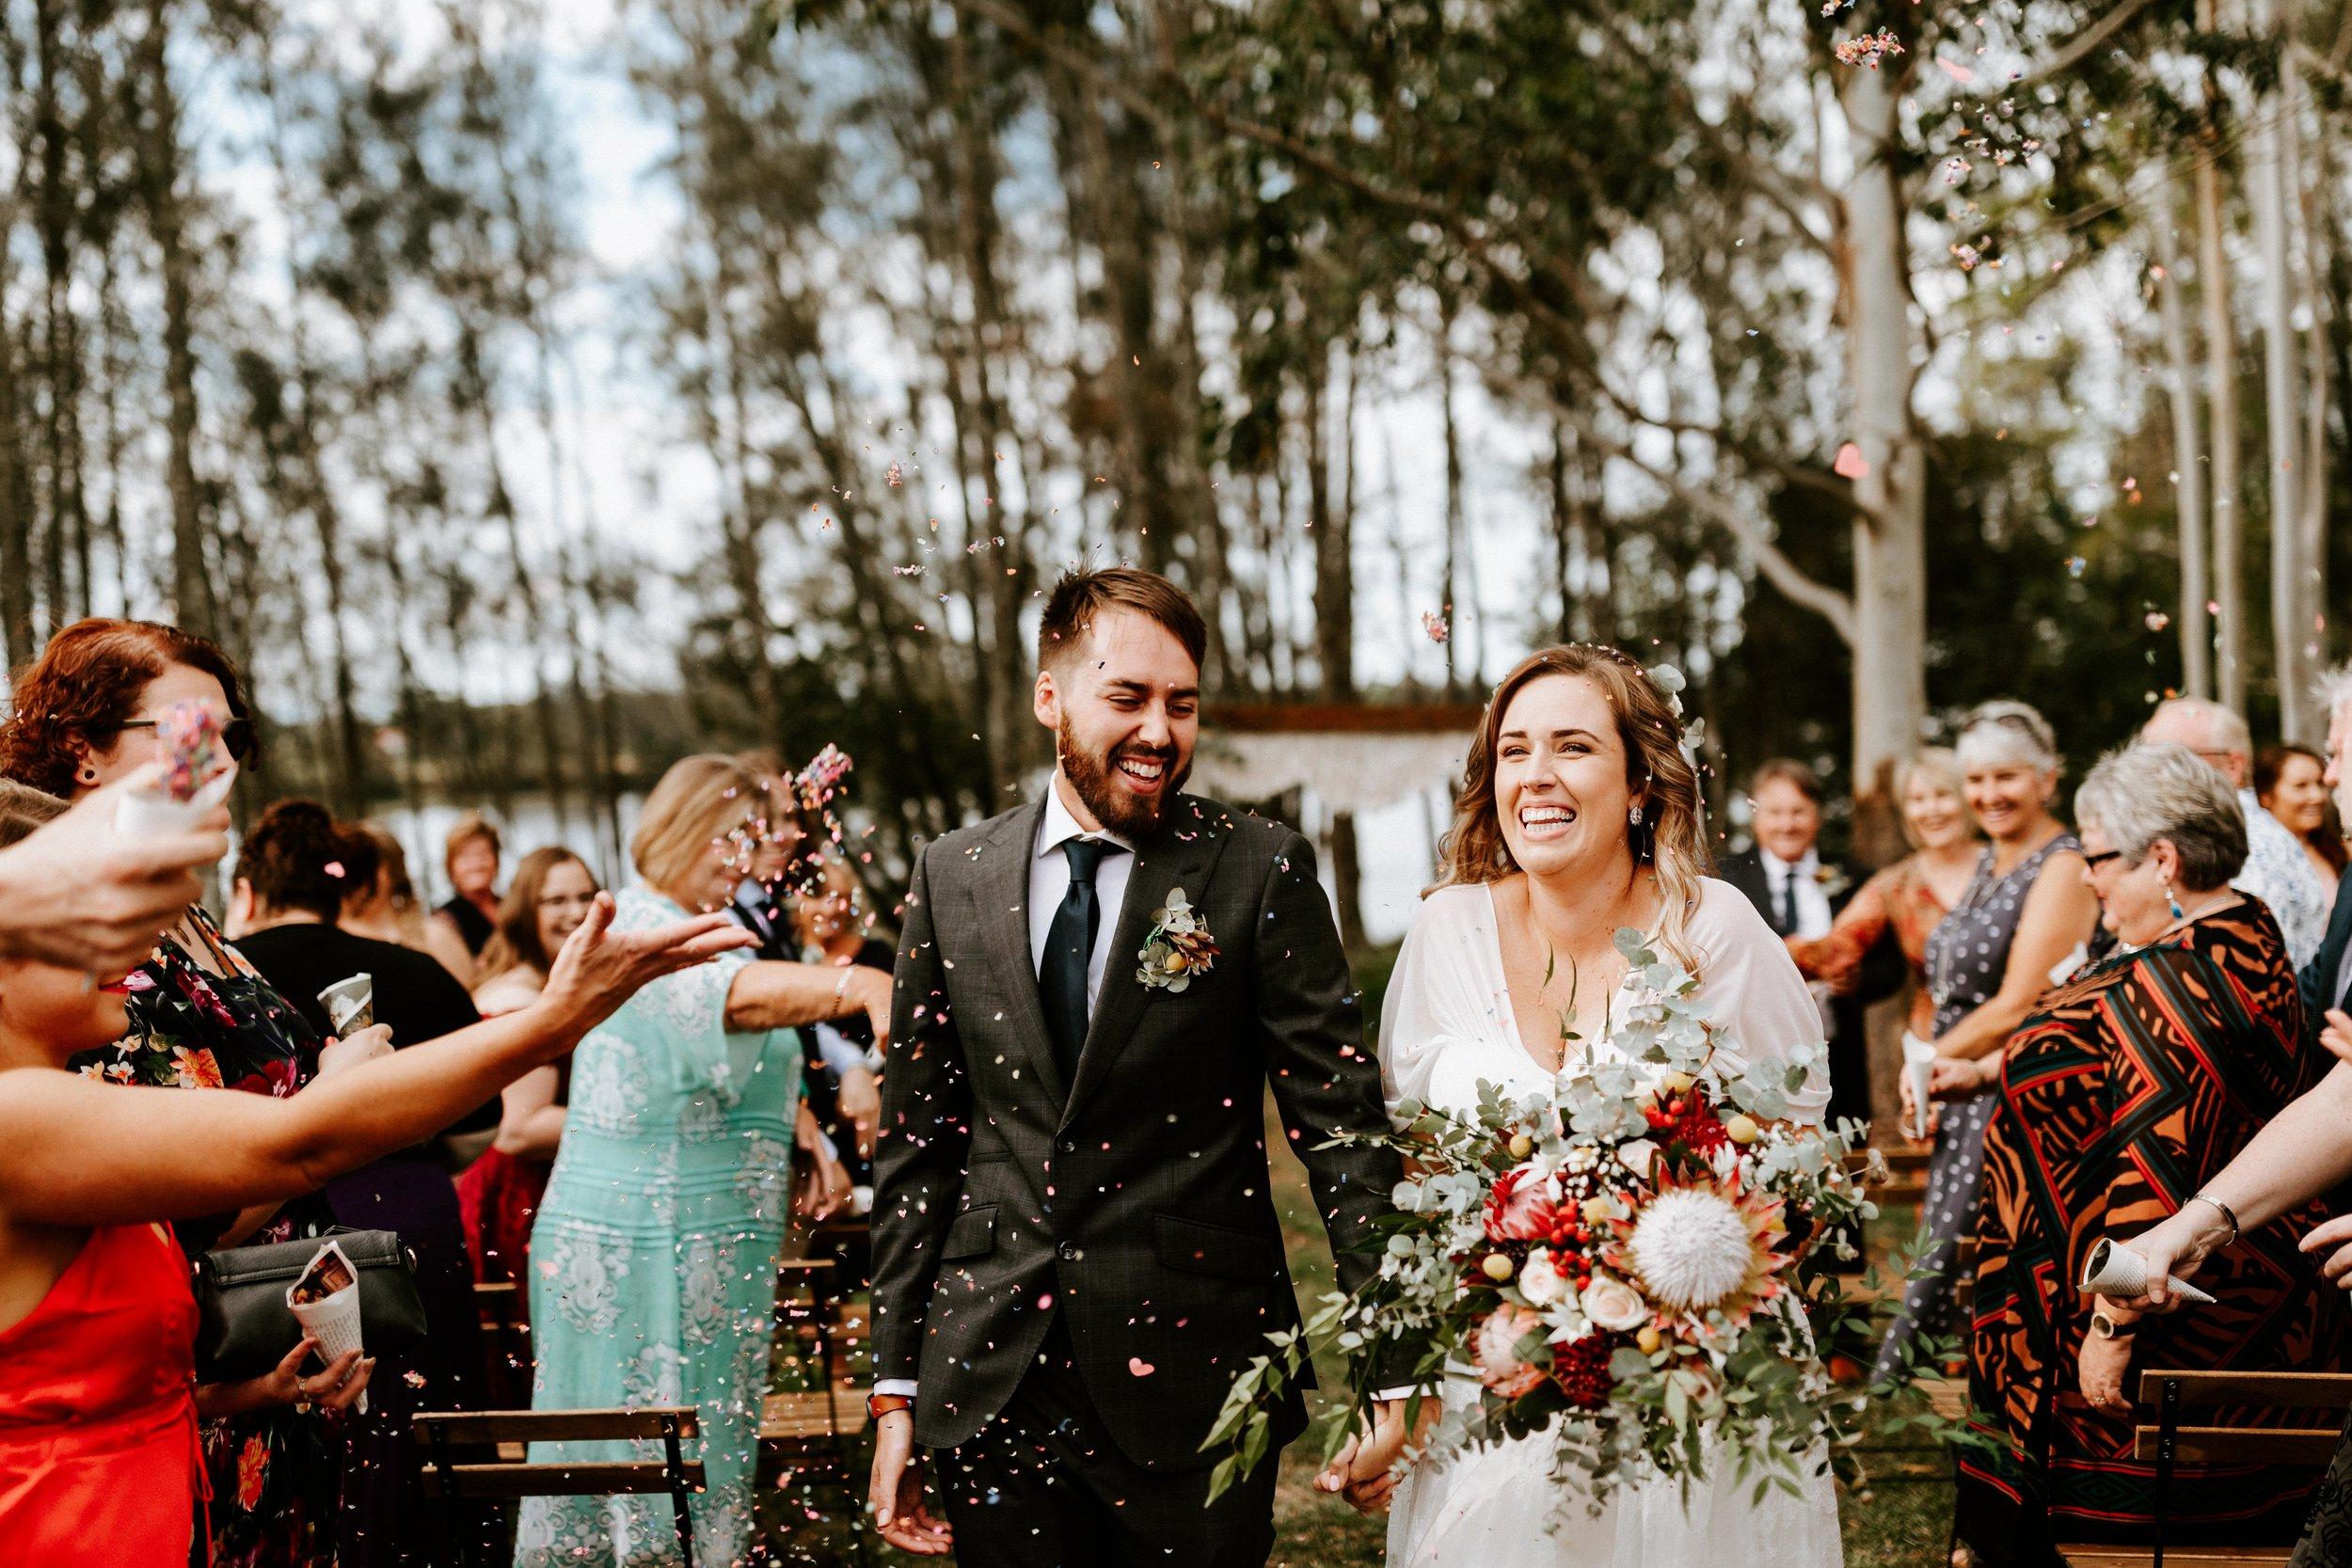 Emily_Andrew_Wedding_Photos_FINALS-494.jpg